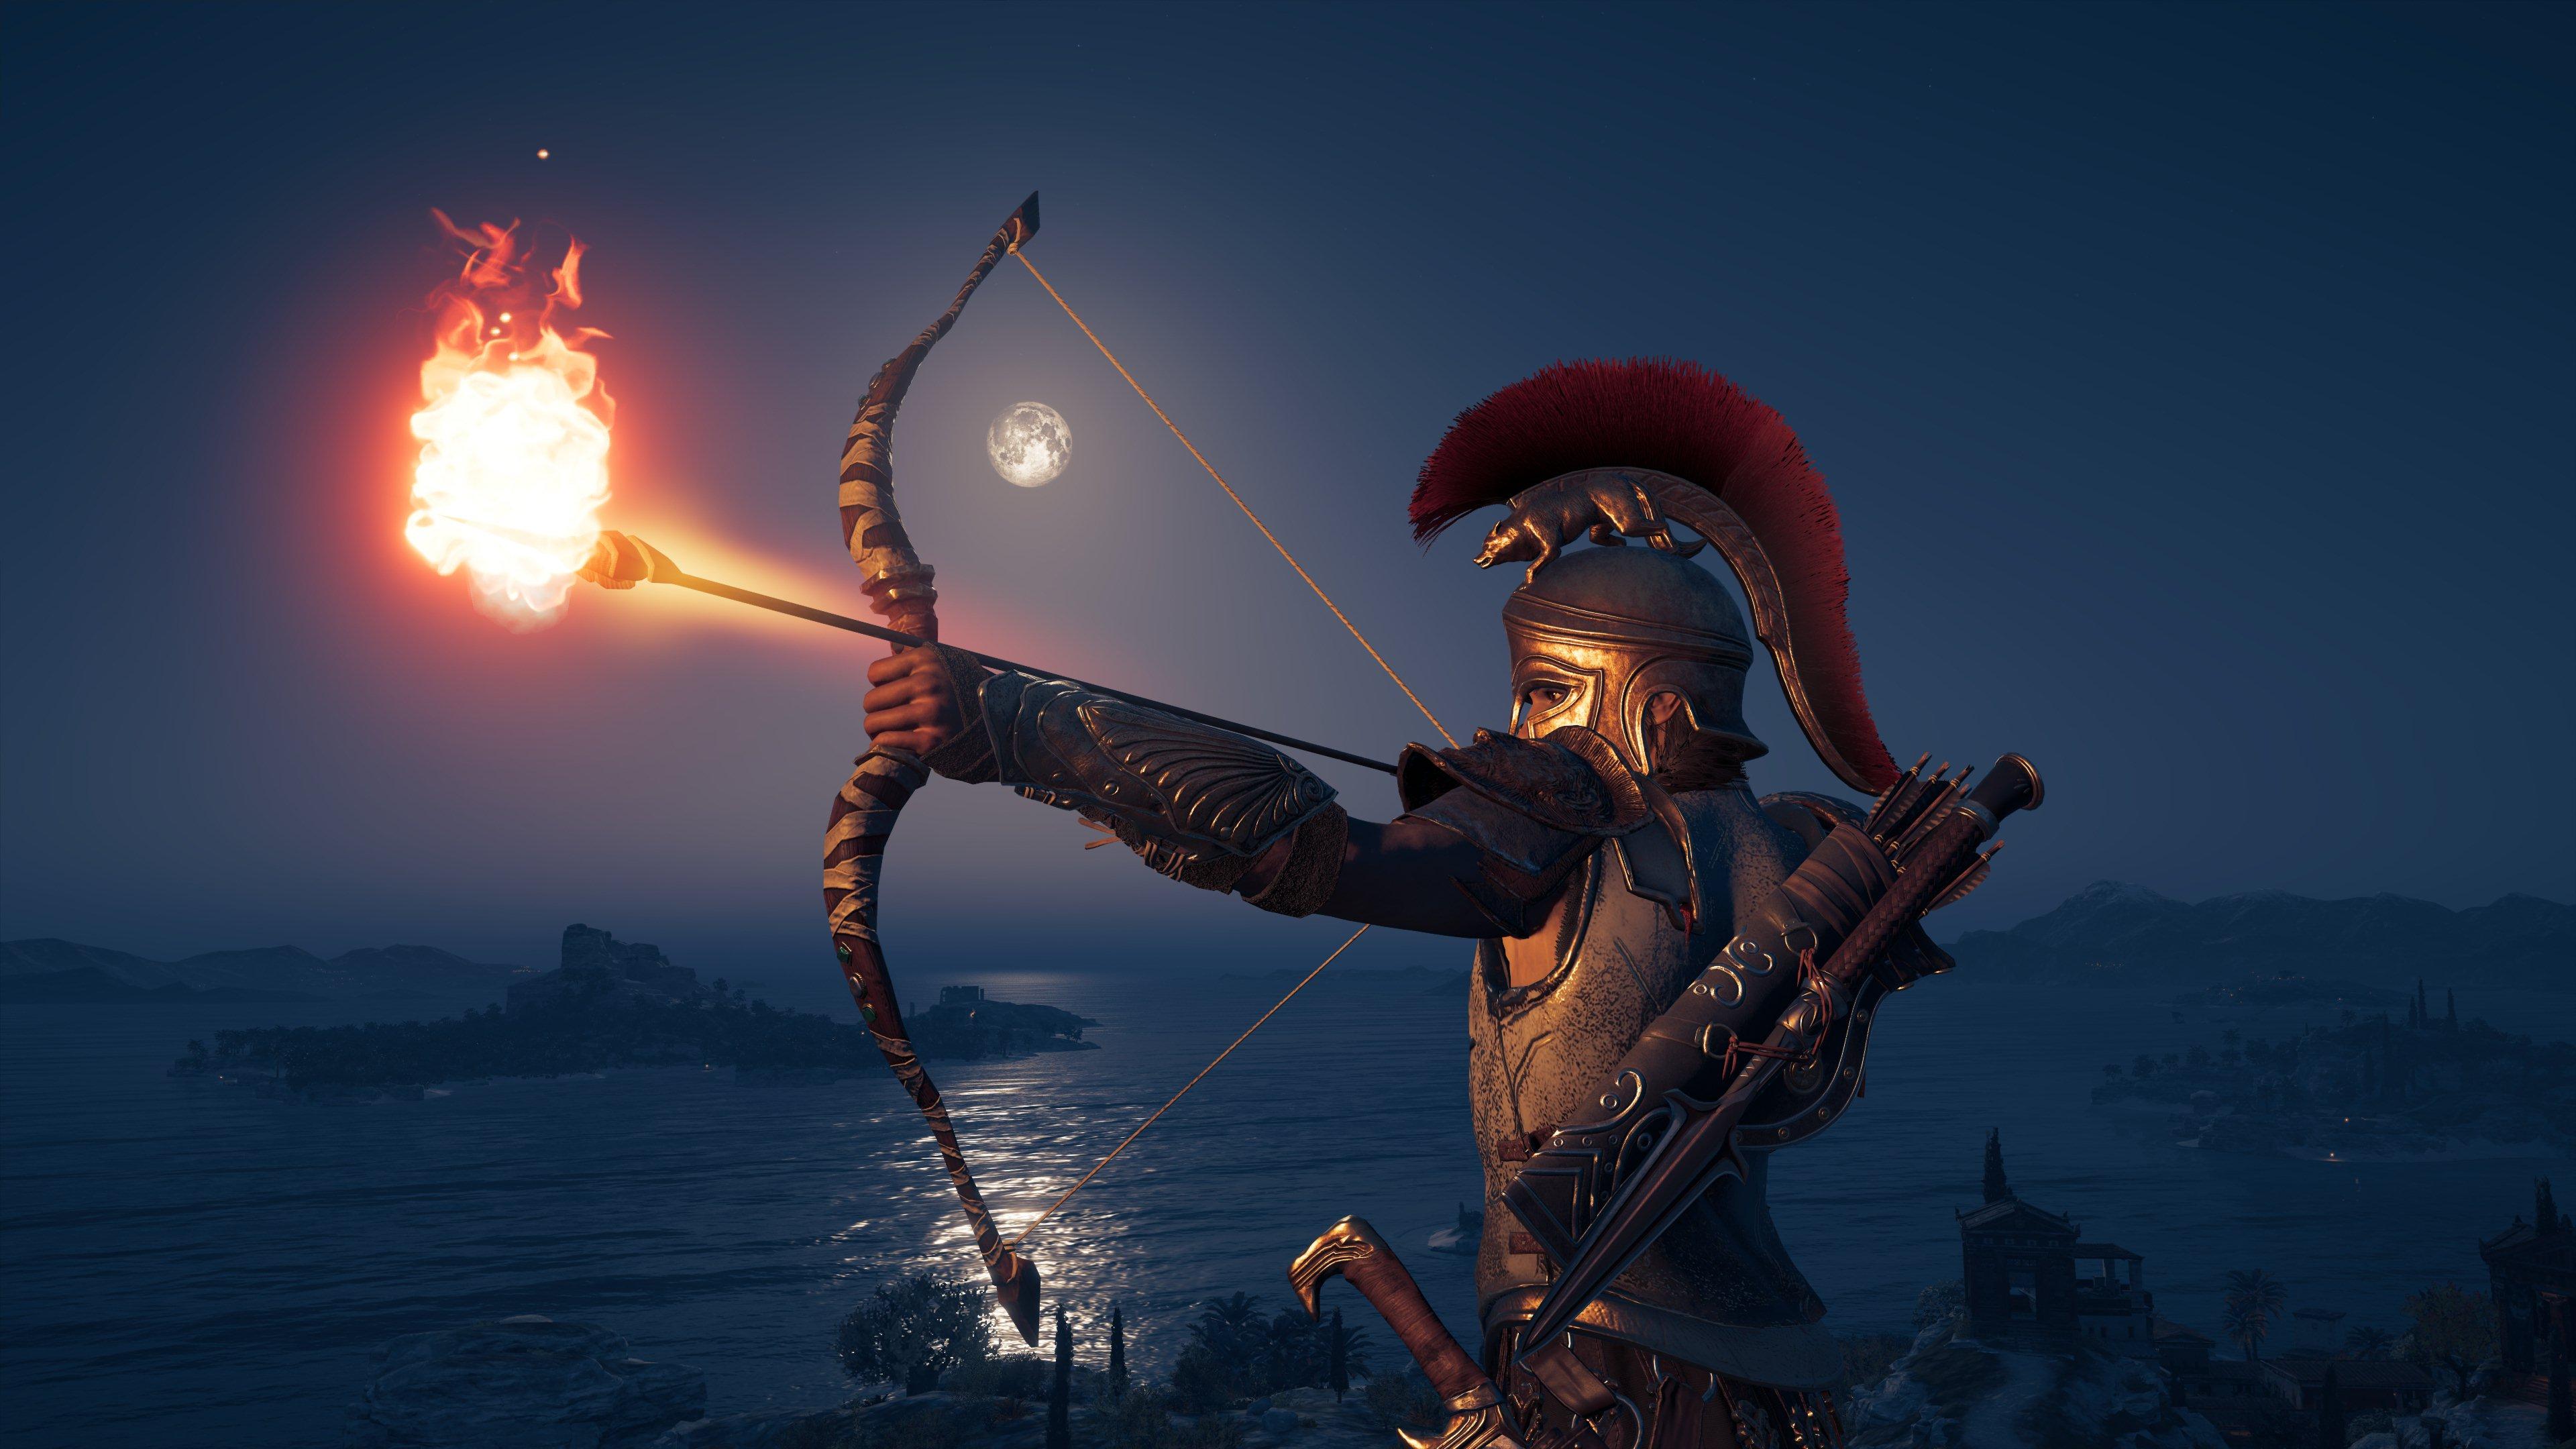 20181025133532.jpg - Assassin's Creed: Odyssey